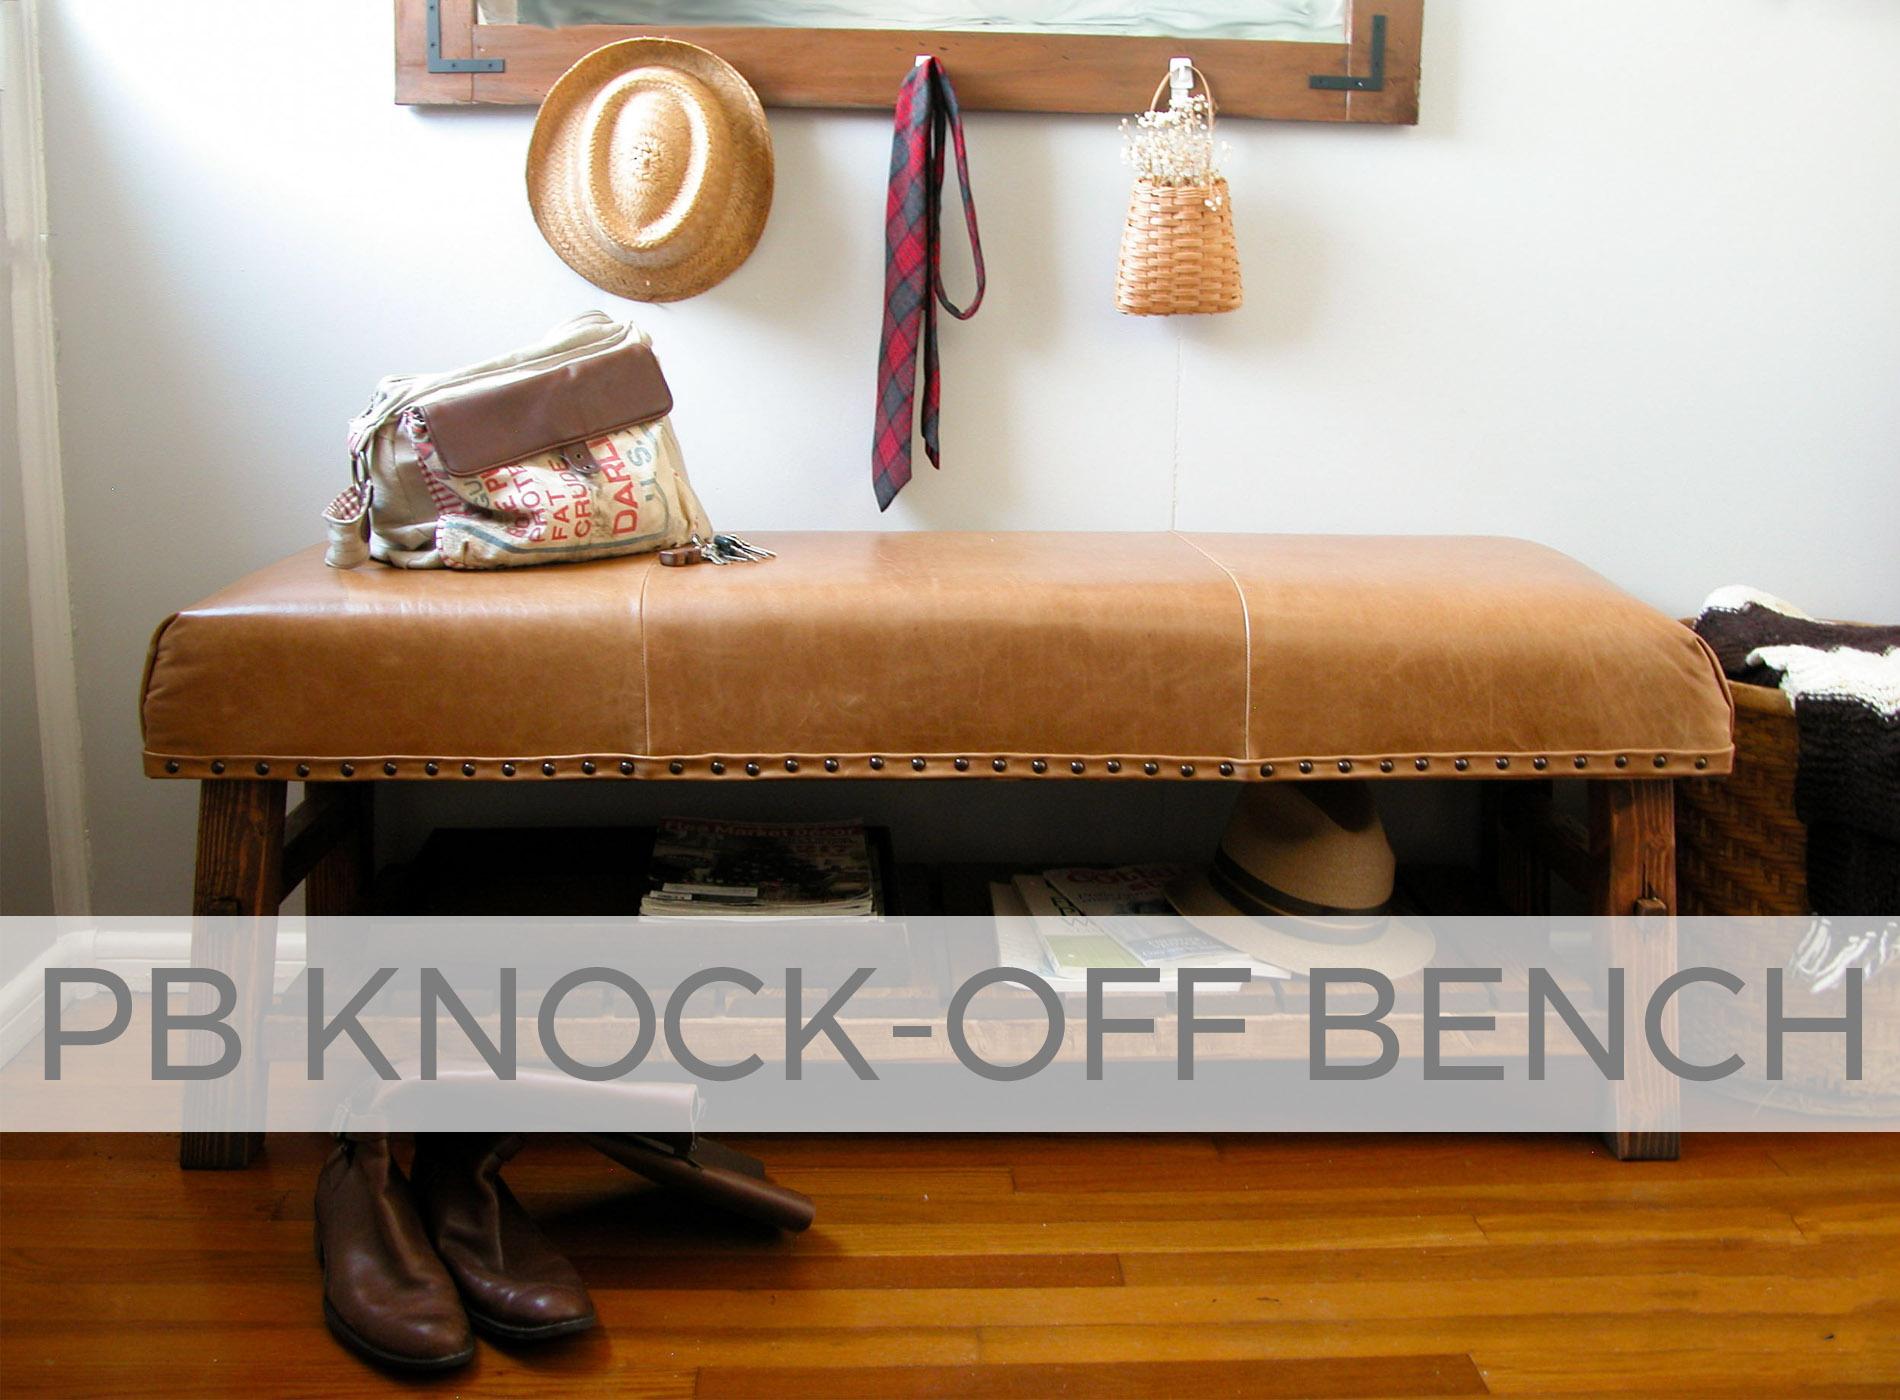 Prodigal Pieces PB Knock Off Bench | prodigalpieces.com